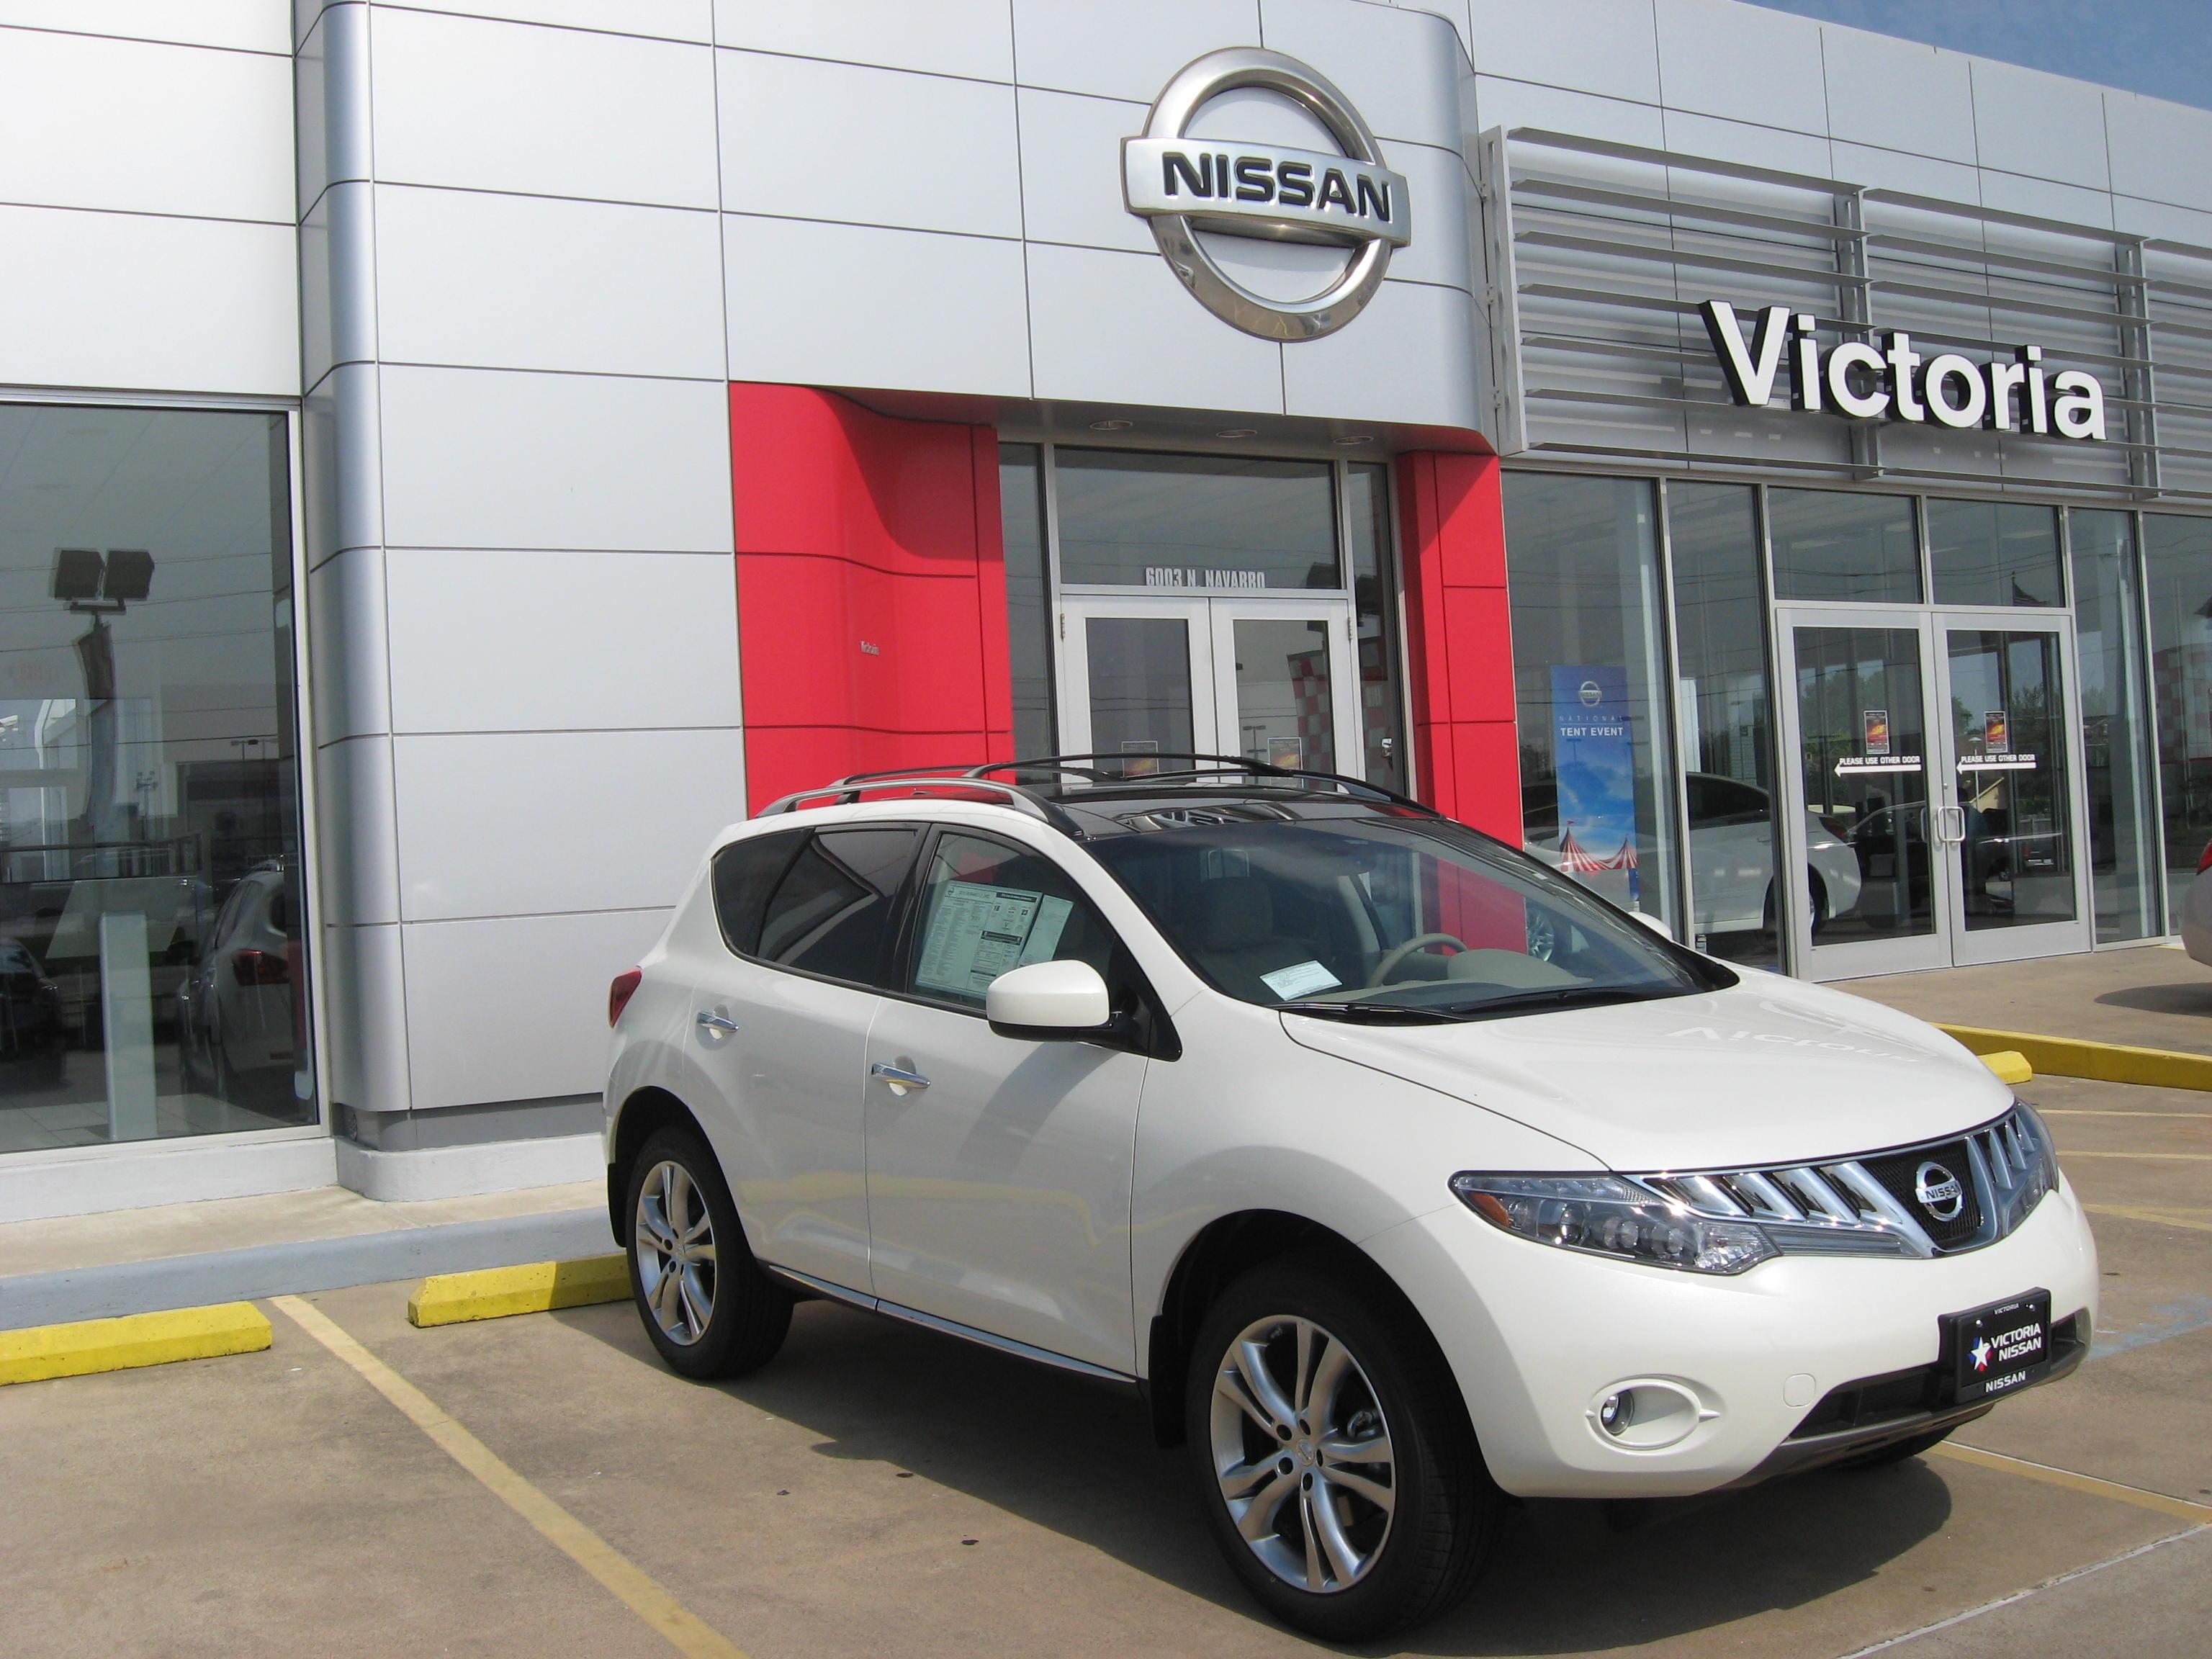 Exterior & Exterior « Victoria Nissan News